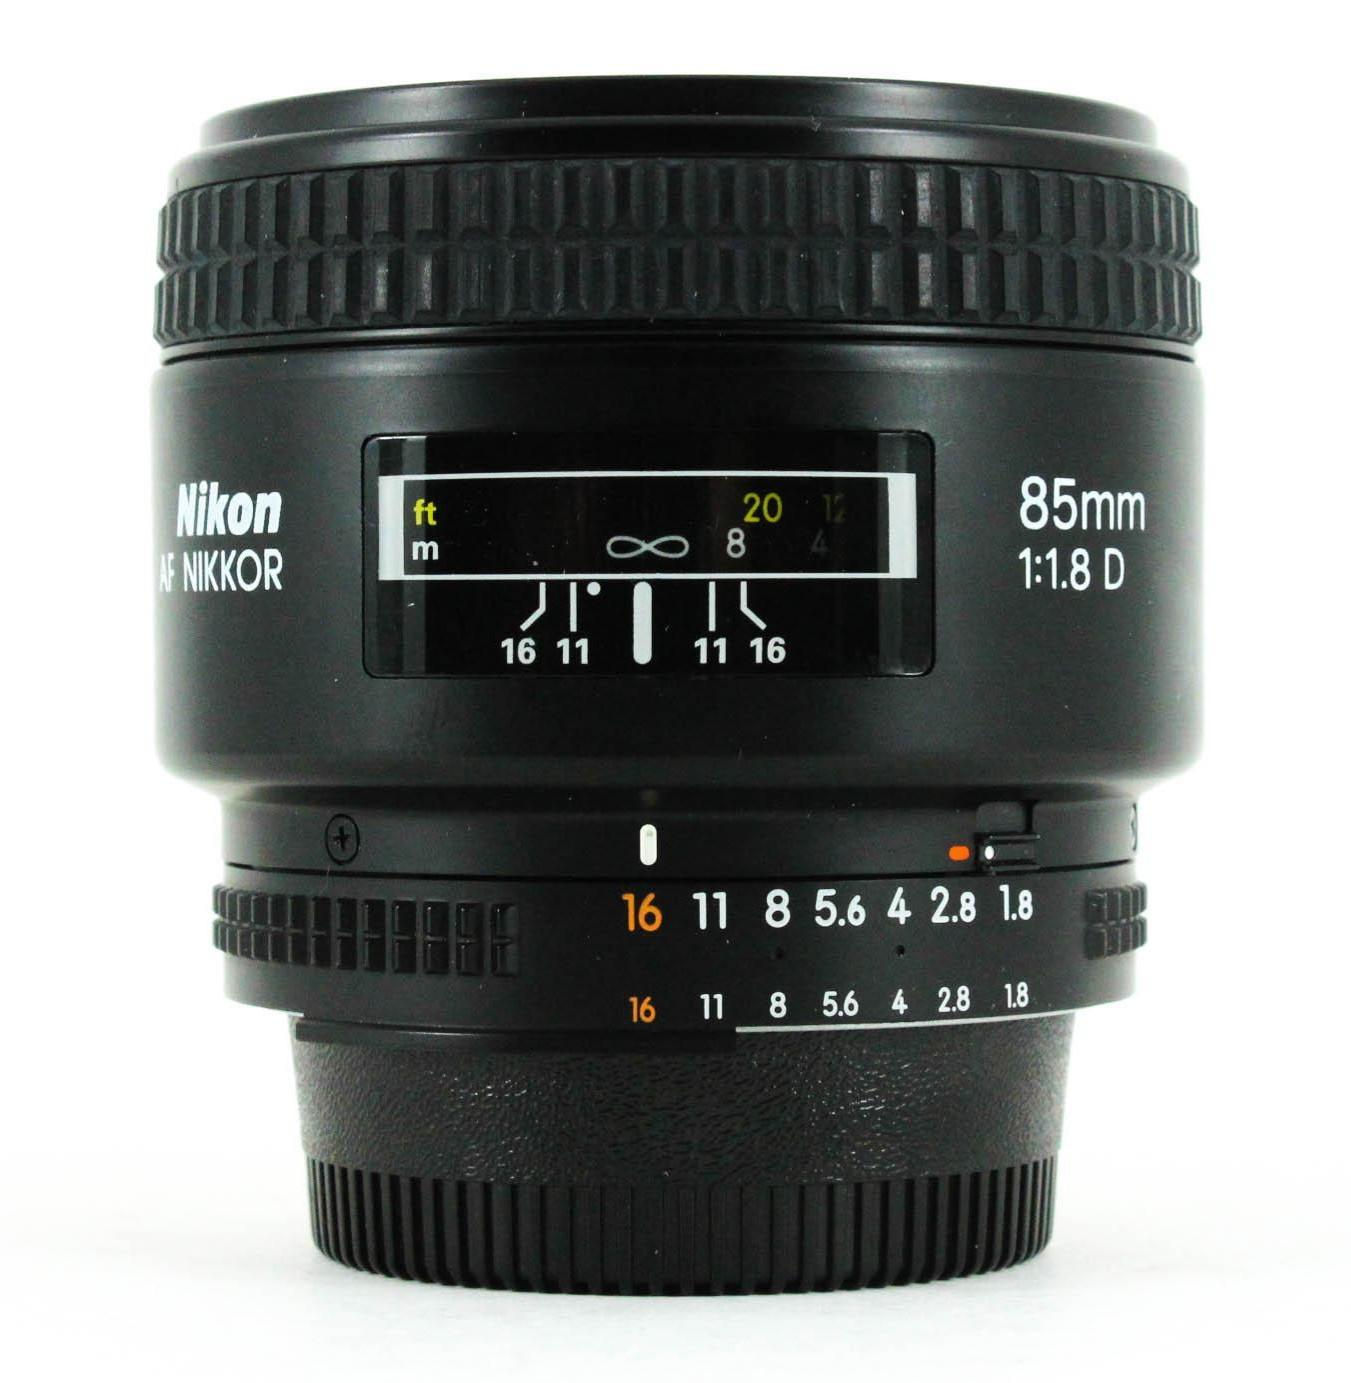 nikon 85mm f1.8 image